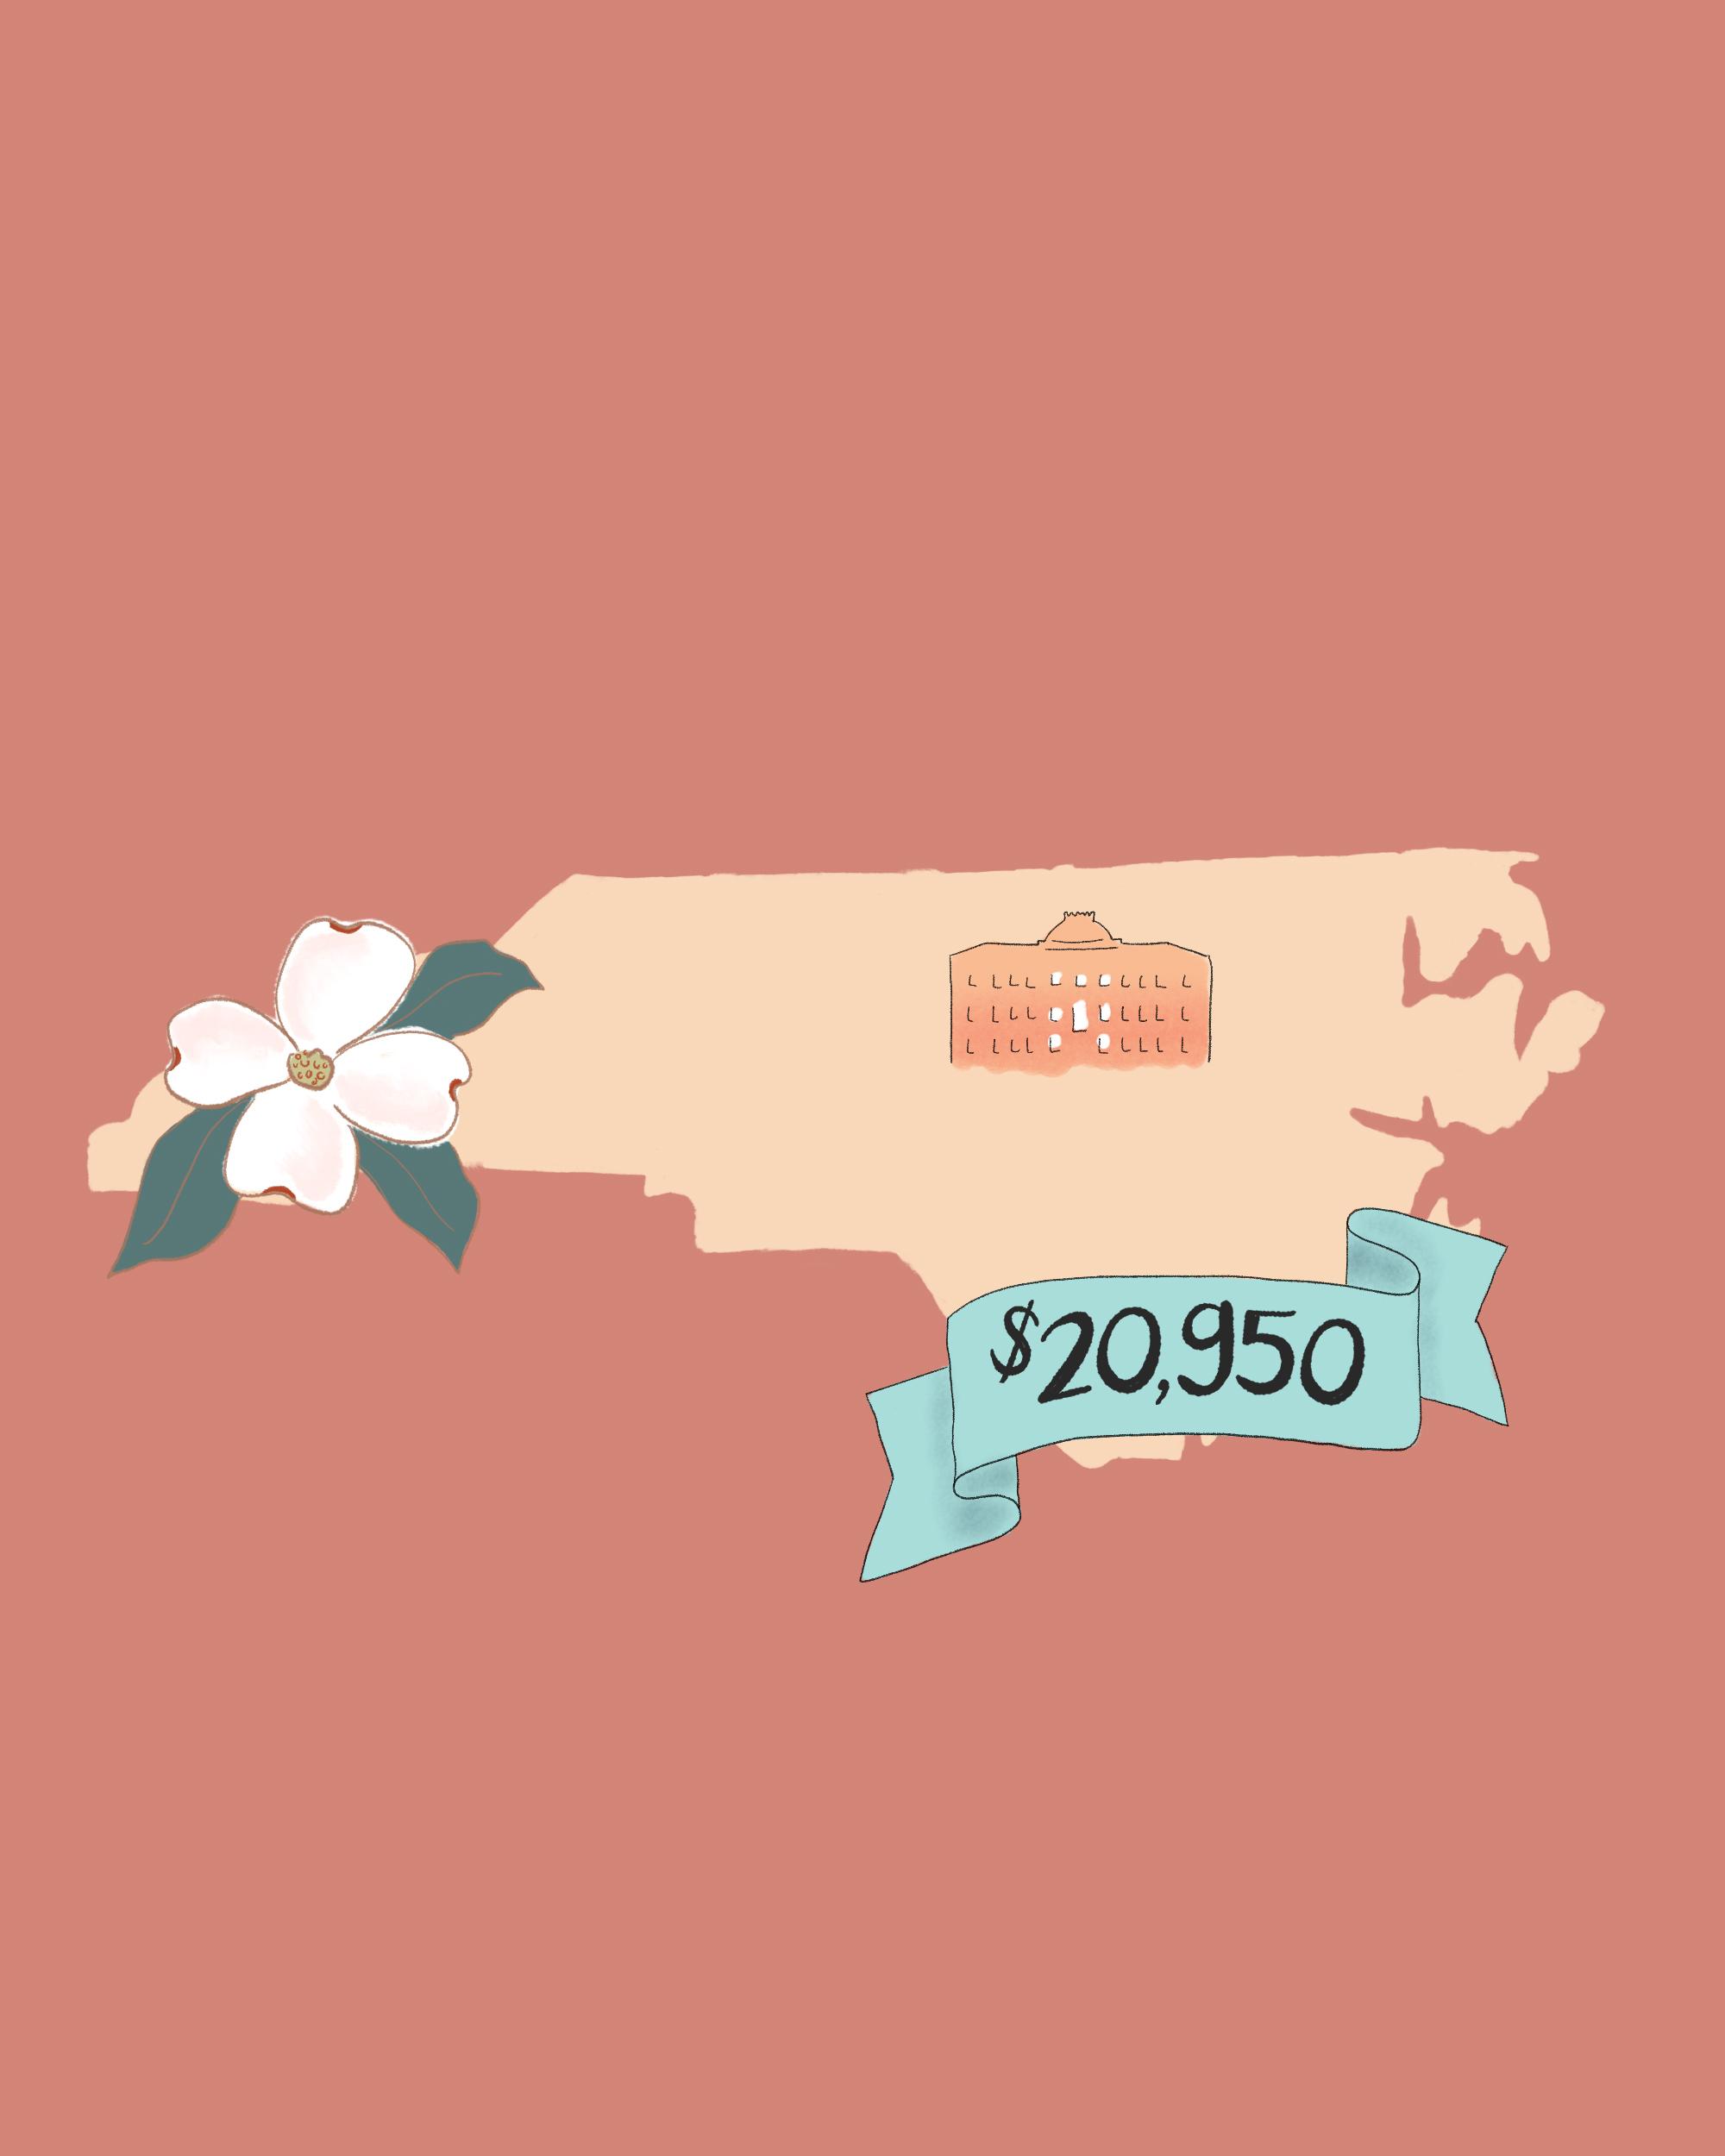 state wedding costs illustration north carolina